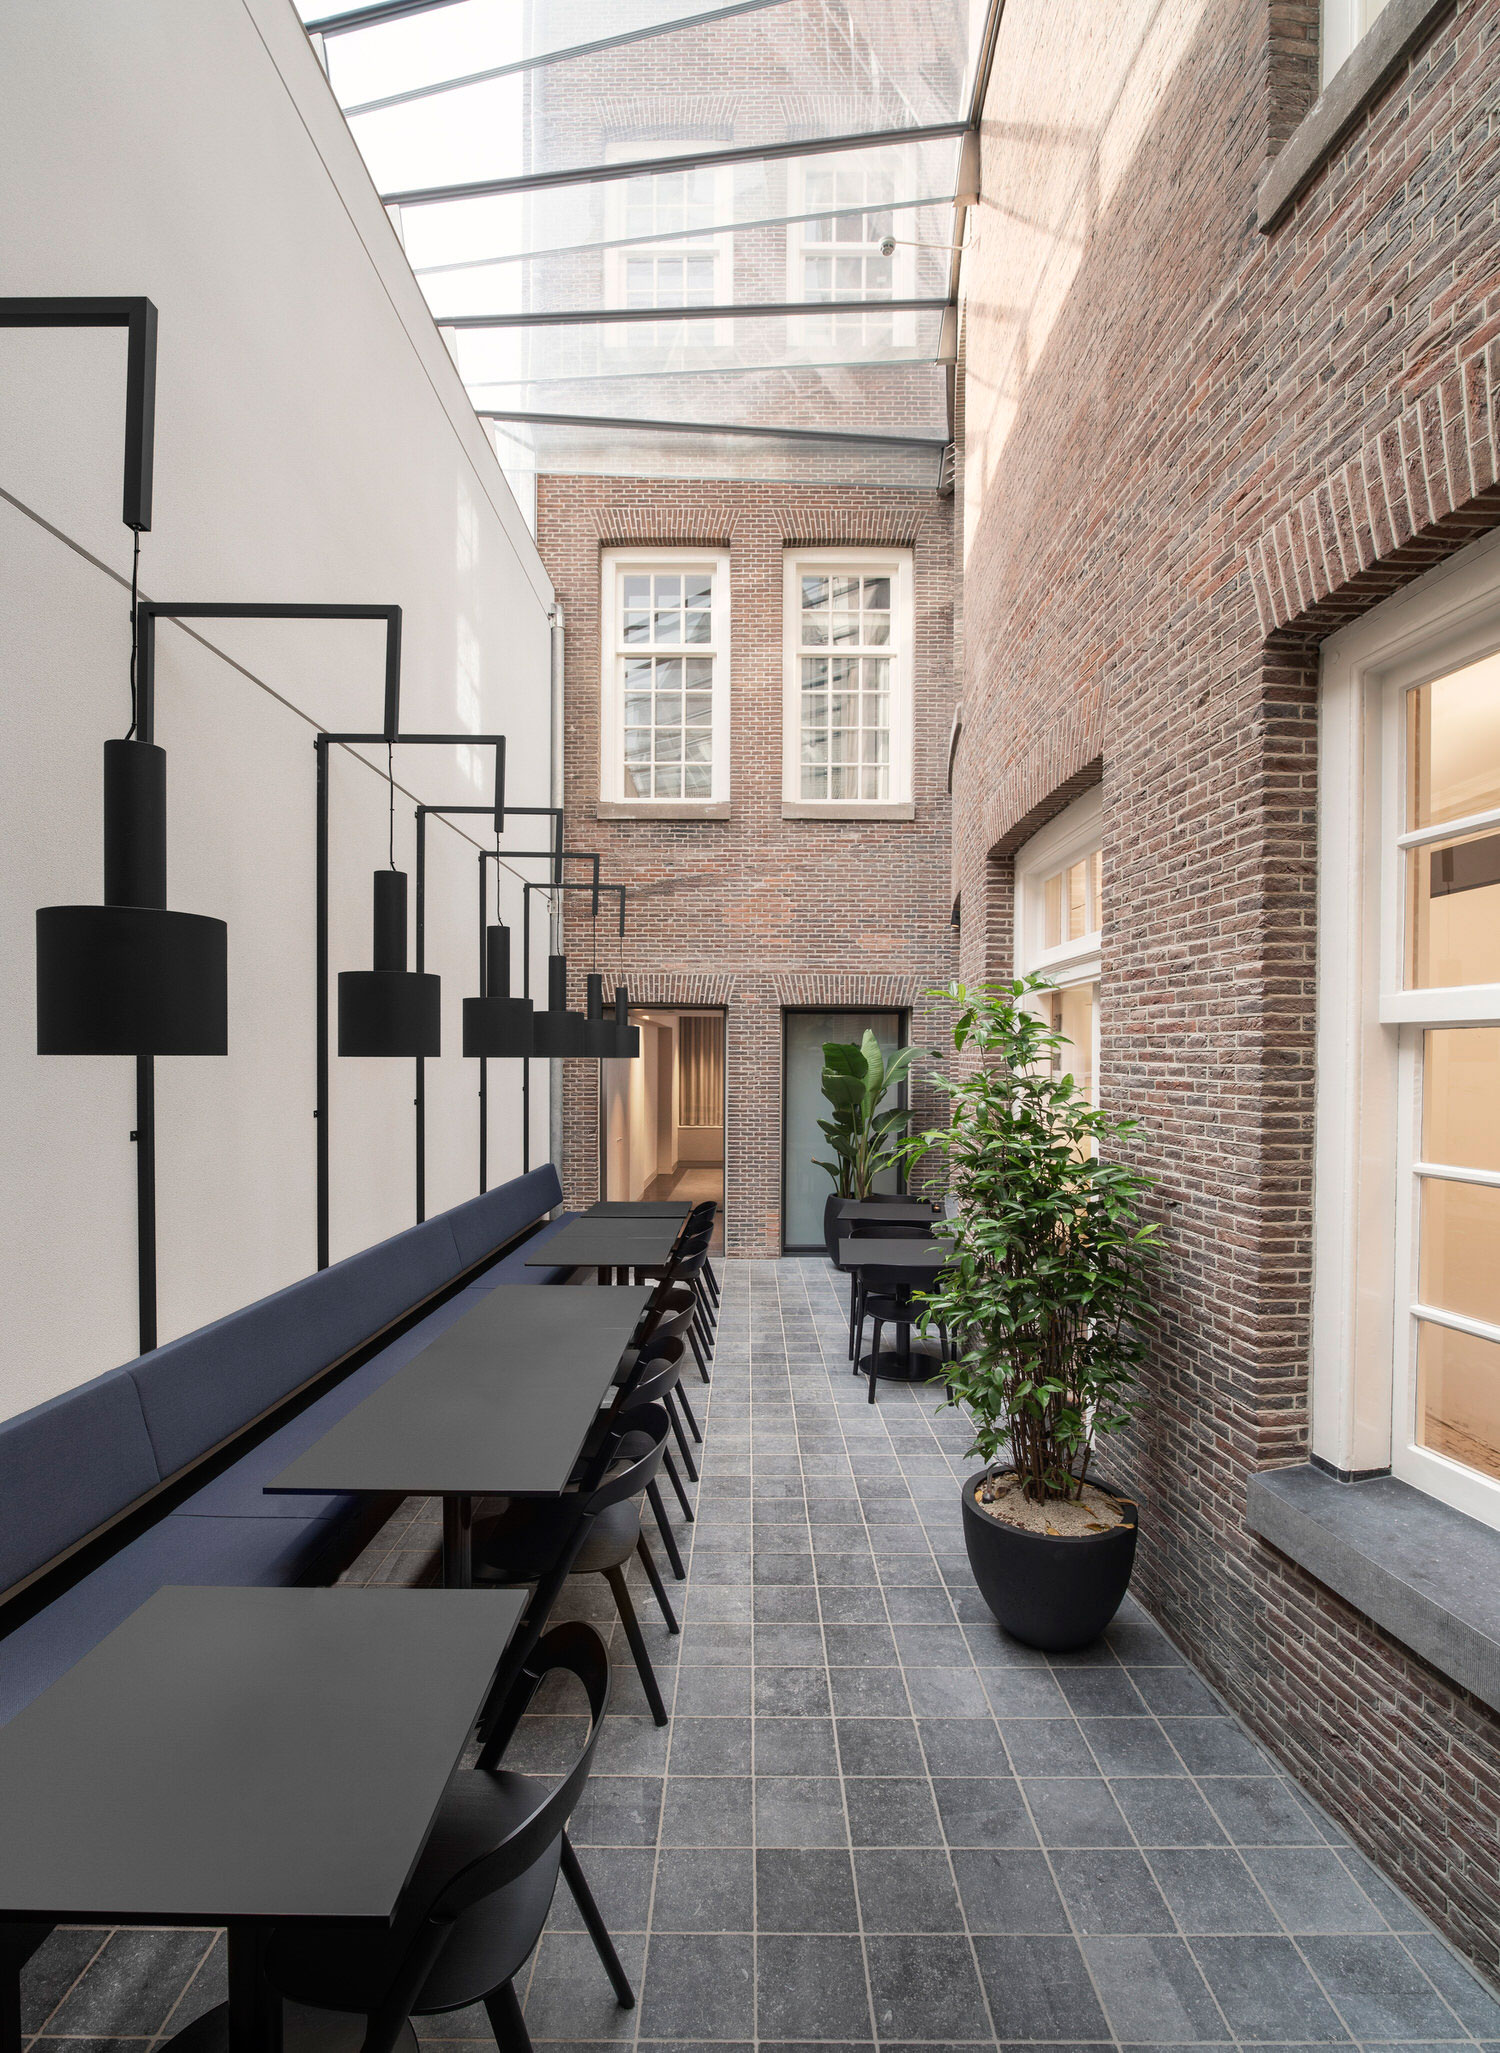 Trappenhuis Lichthof, Felix Meritis Renovation, Amsterdam, I29 | Yellowtrace